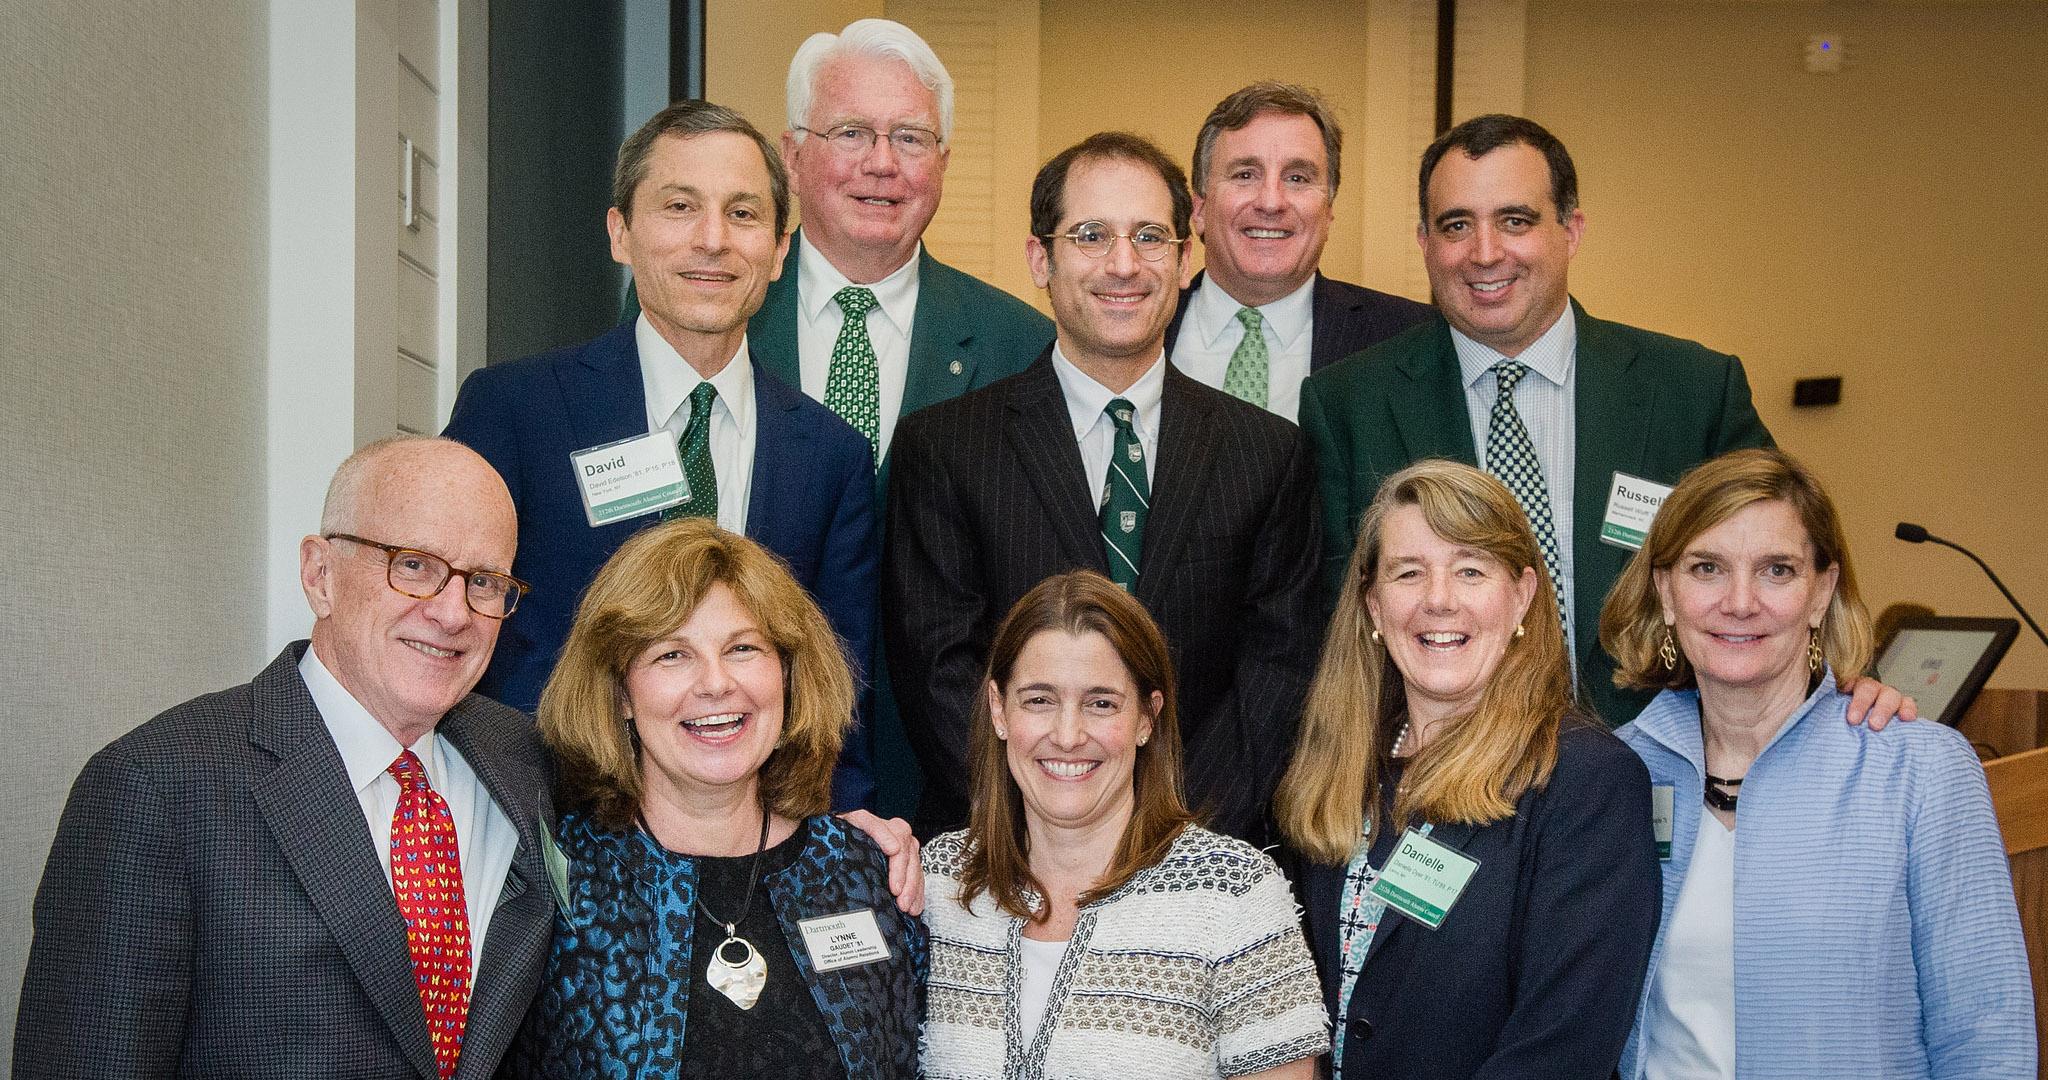 Members of the Dartmouth Alumni Council